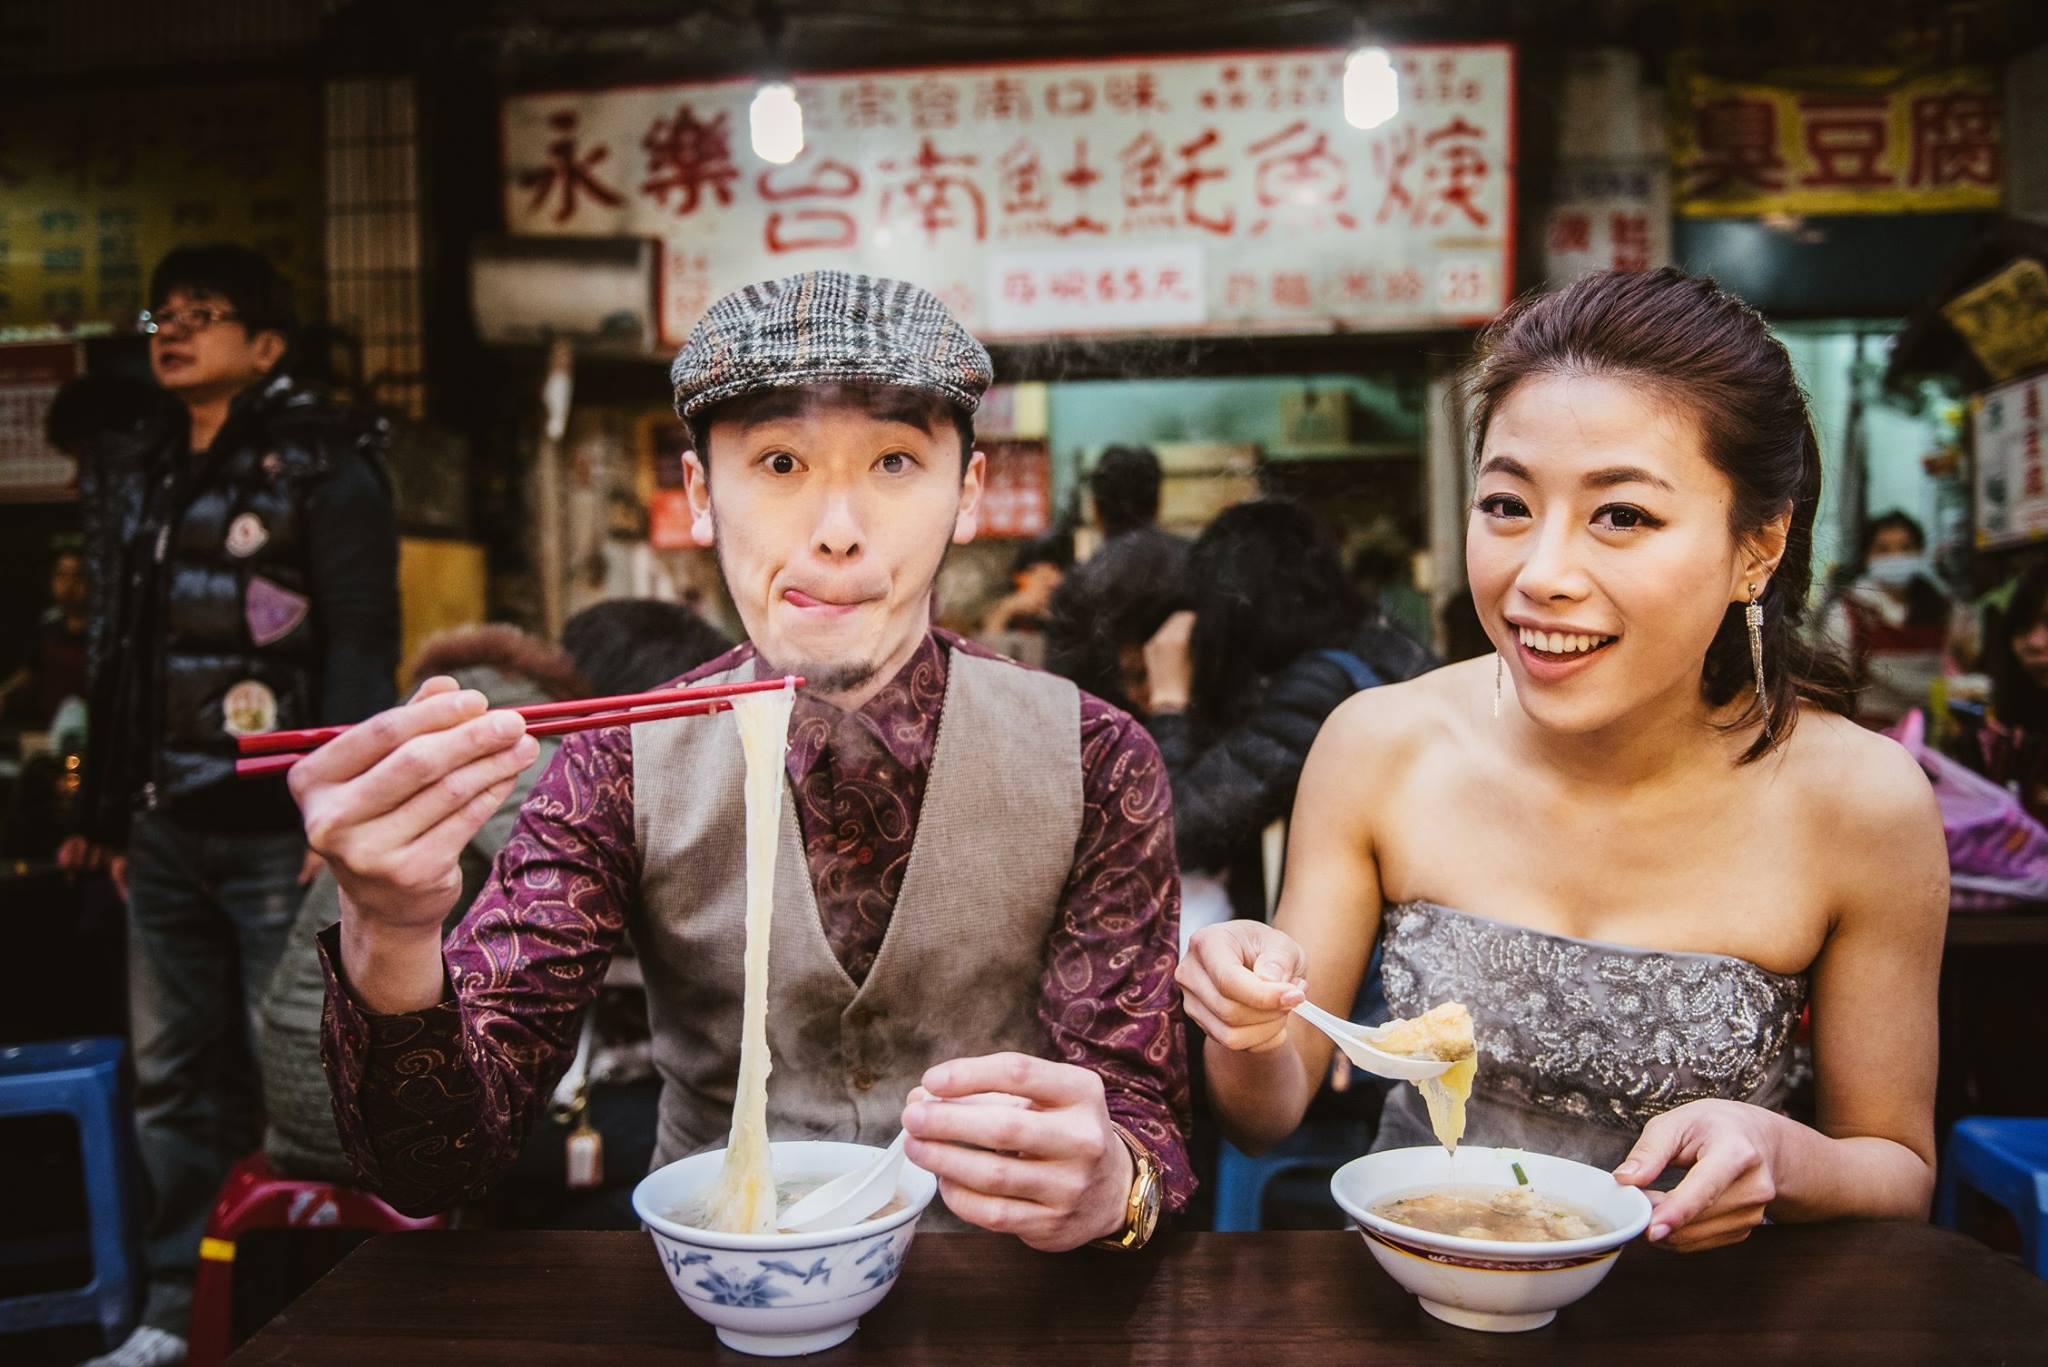 PUREFOTO_台灣自助婚紗攝影Prewedding_自助婚紗復古風格,台北迪化街婚紗拍攝